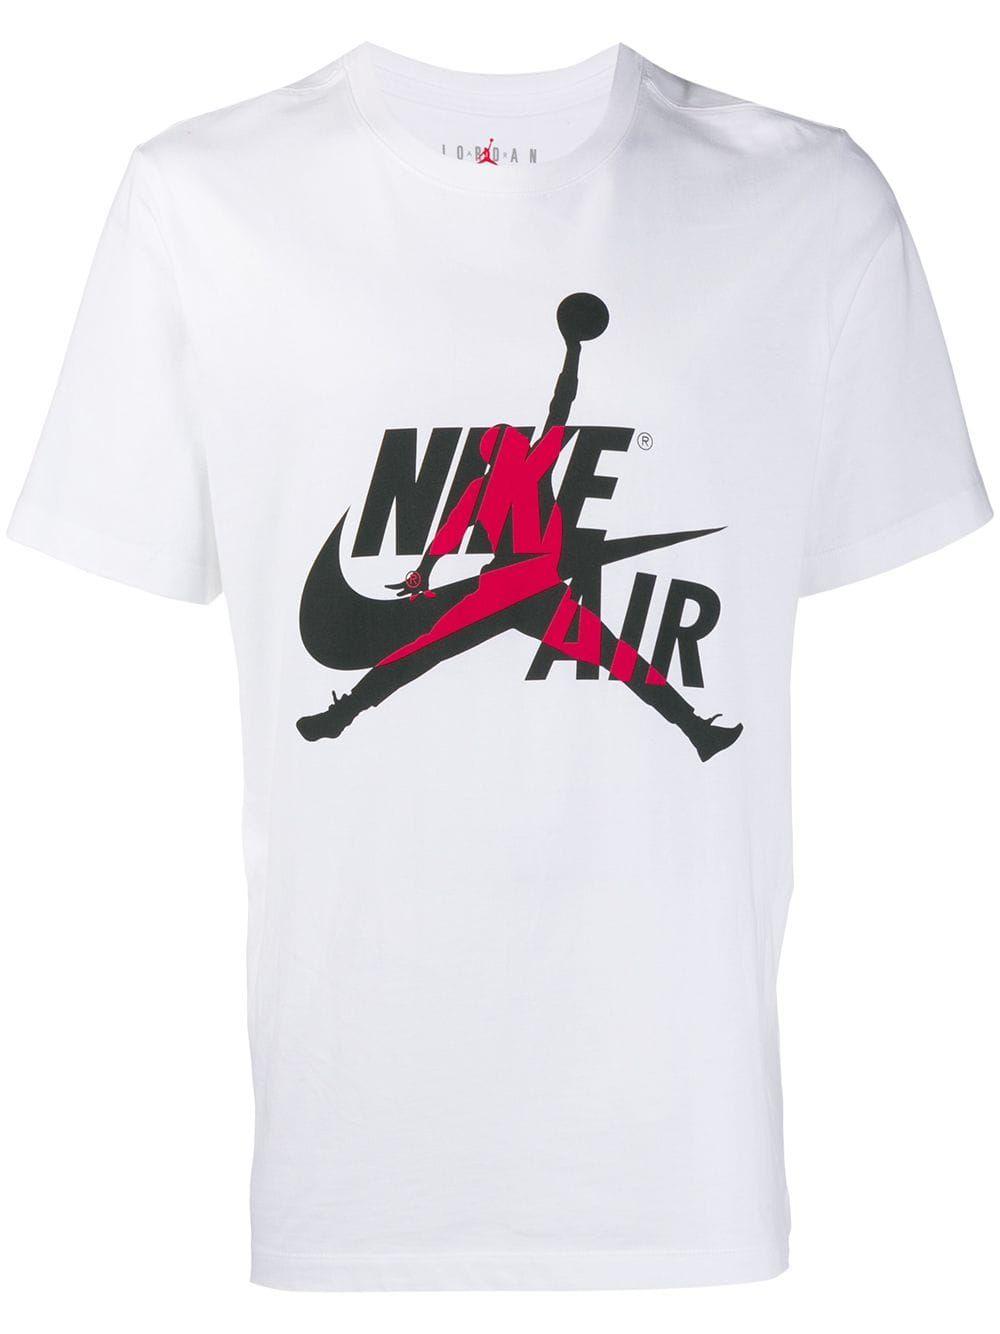 T-shirt   Nike clothes mens, Shirts